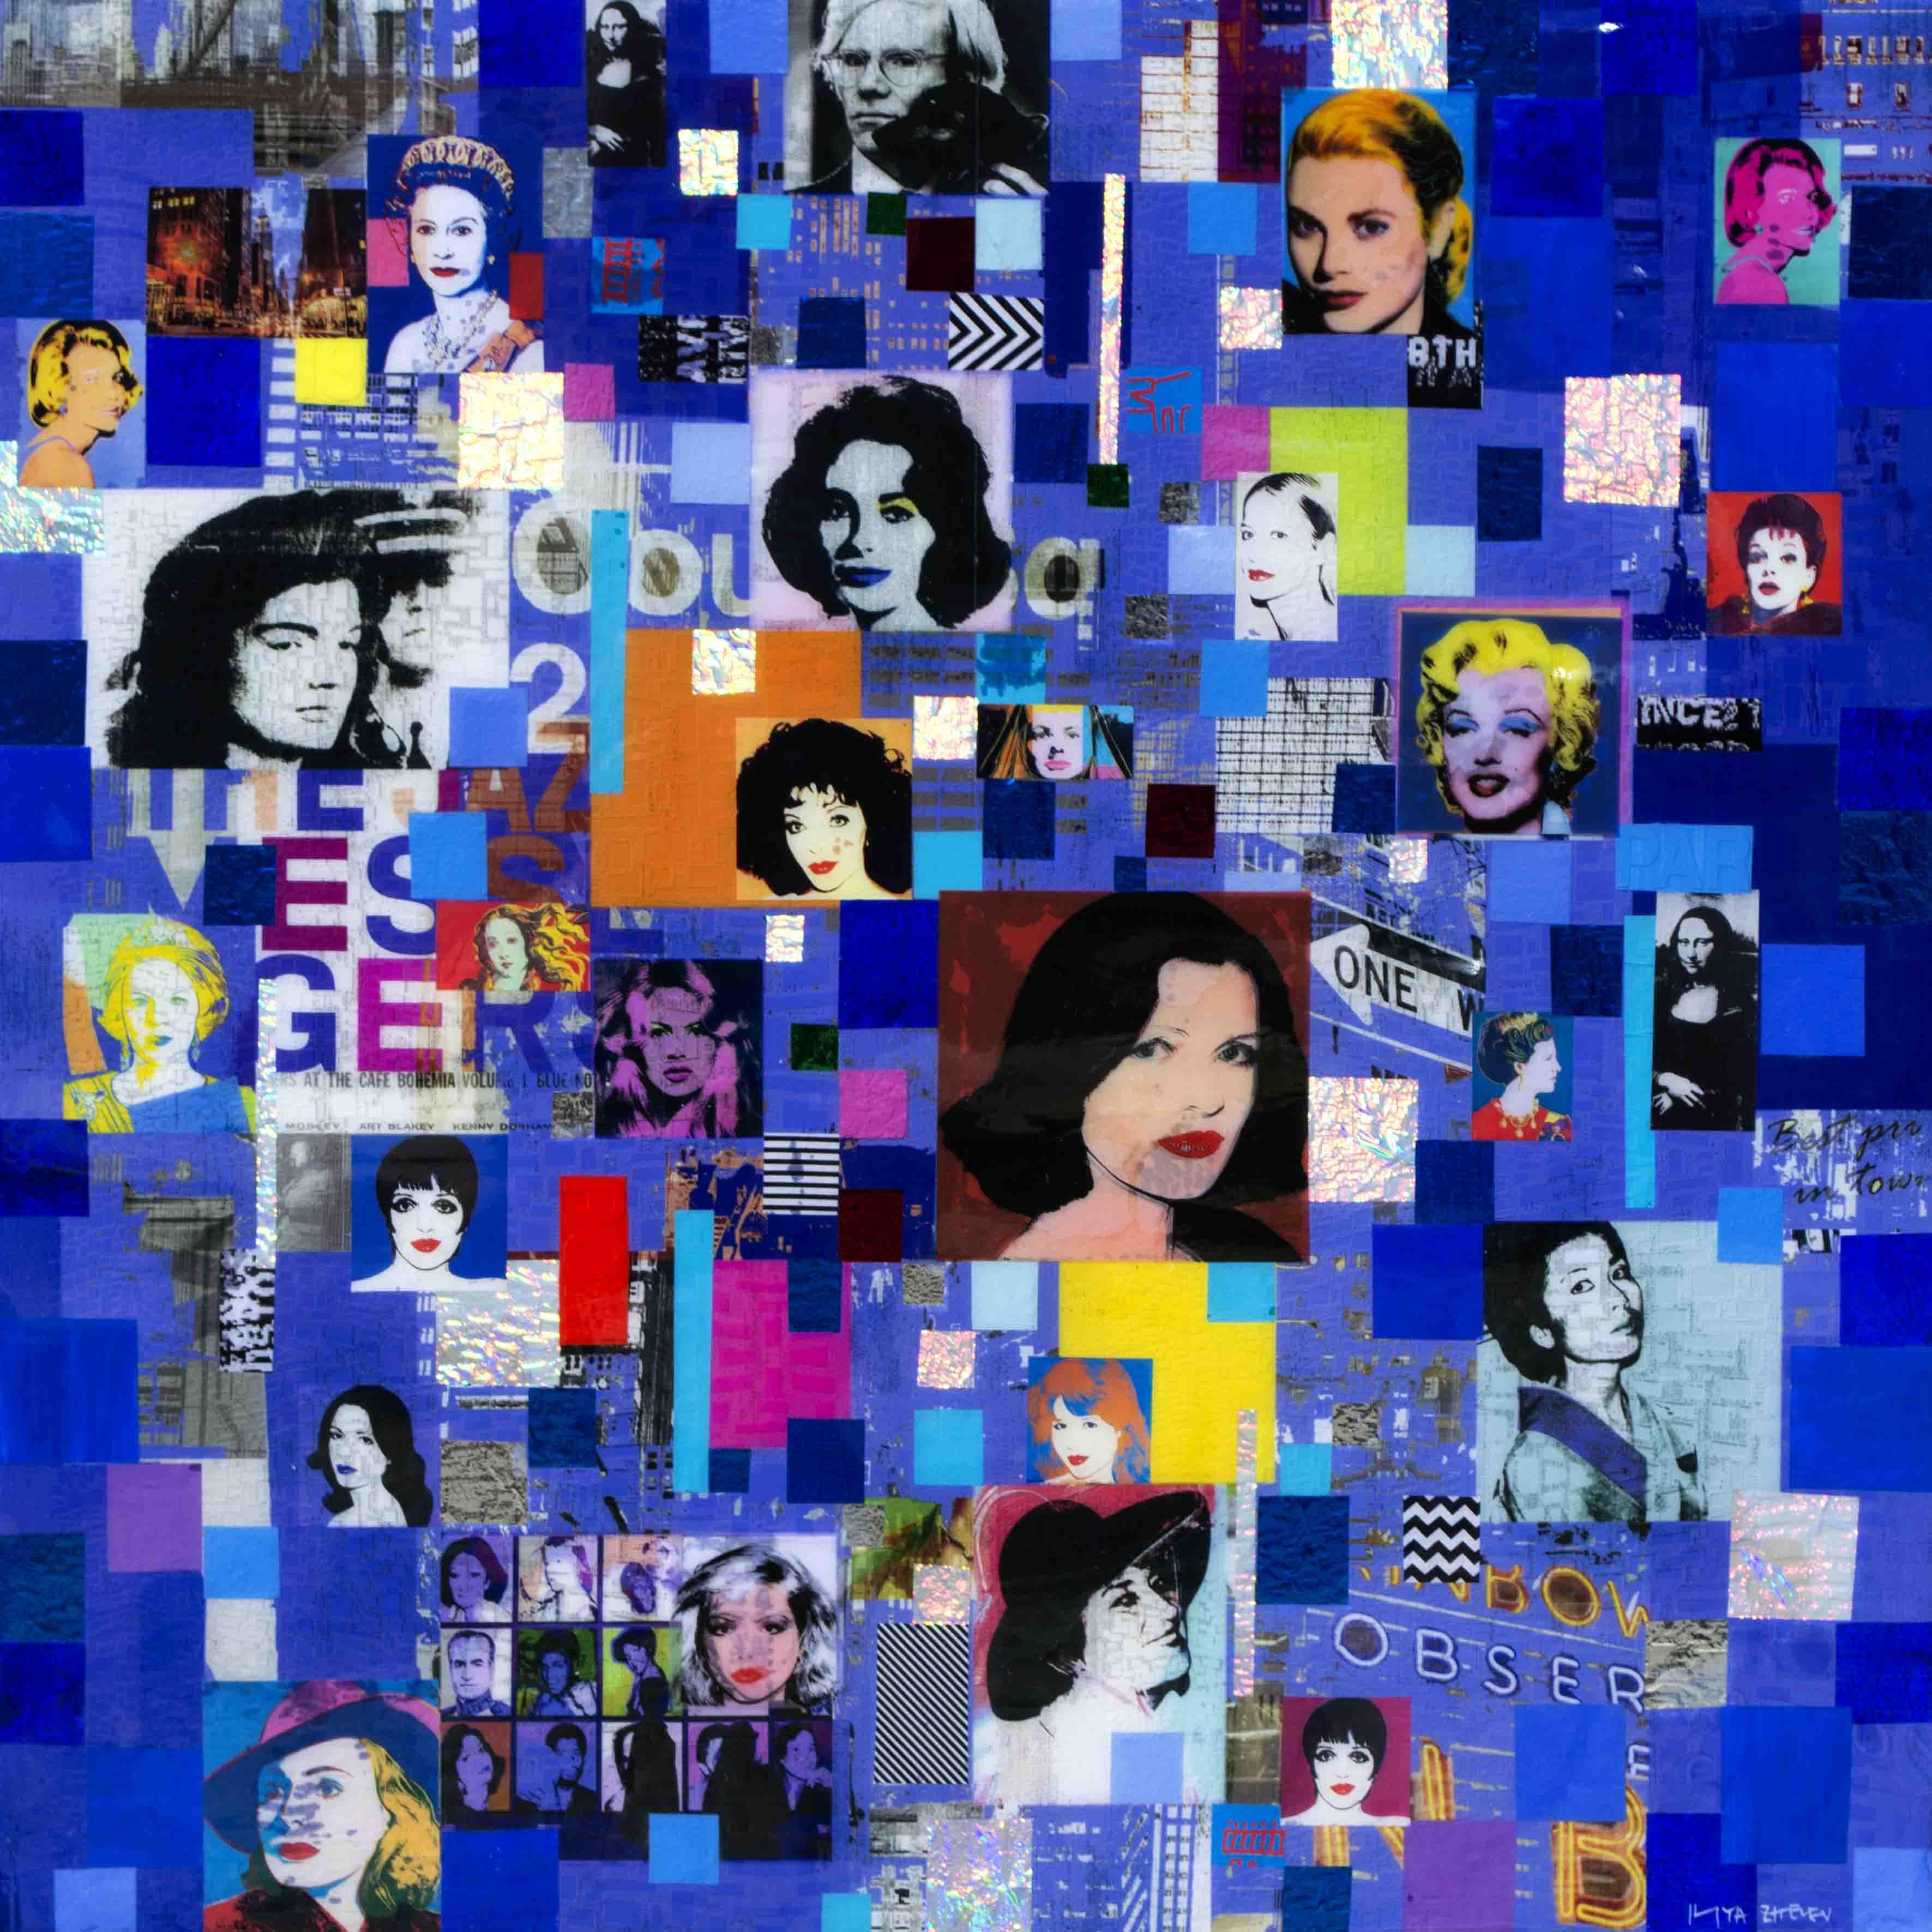 Iliya Zhelev - Andy Warhol's women , 0509-012-978